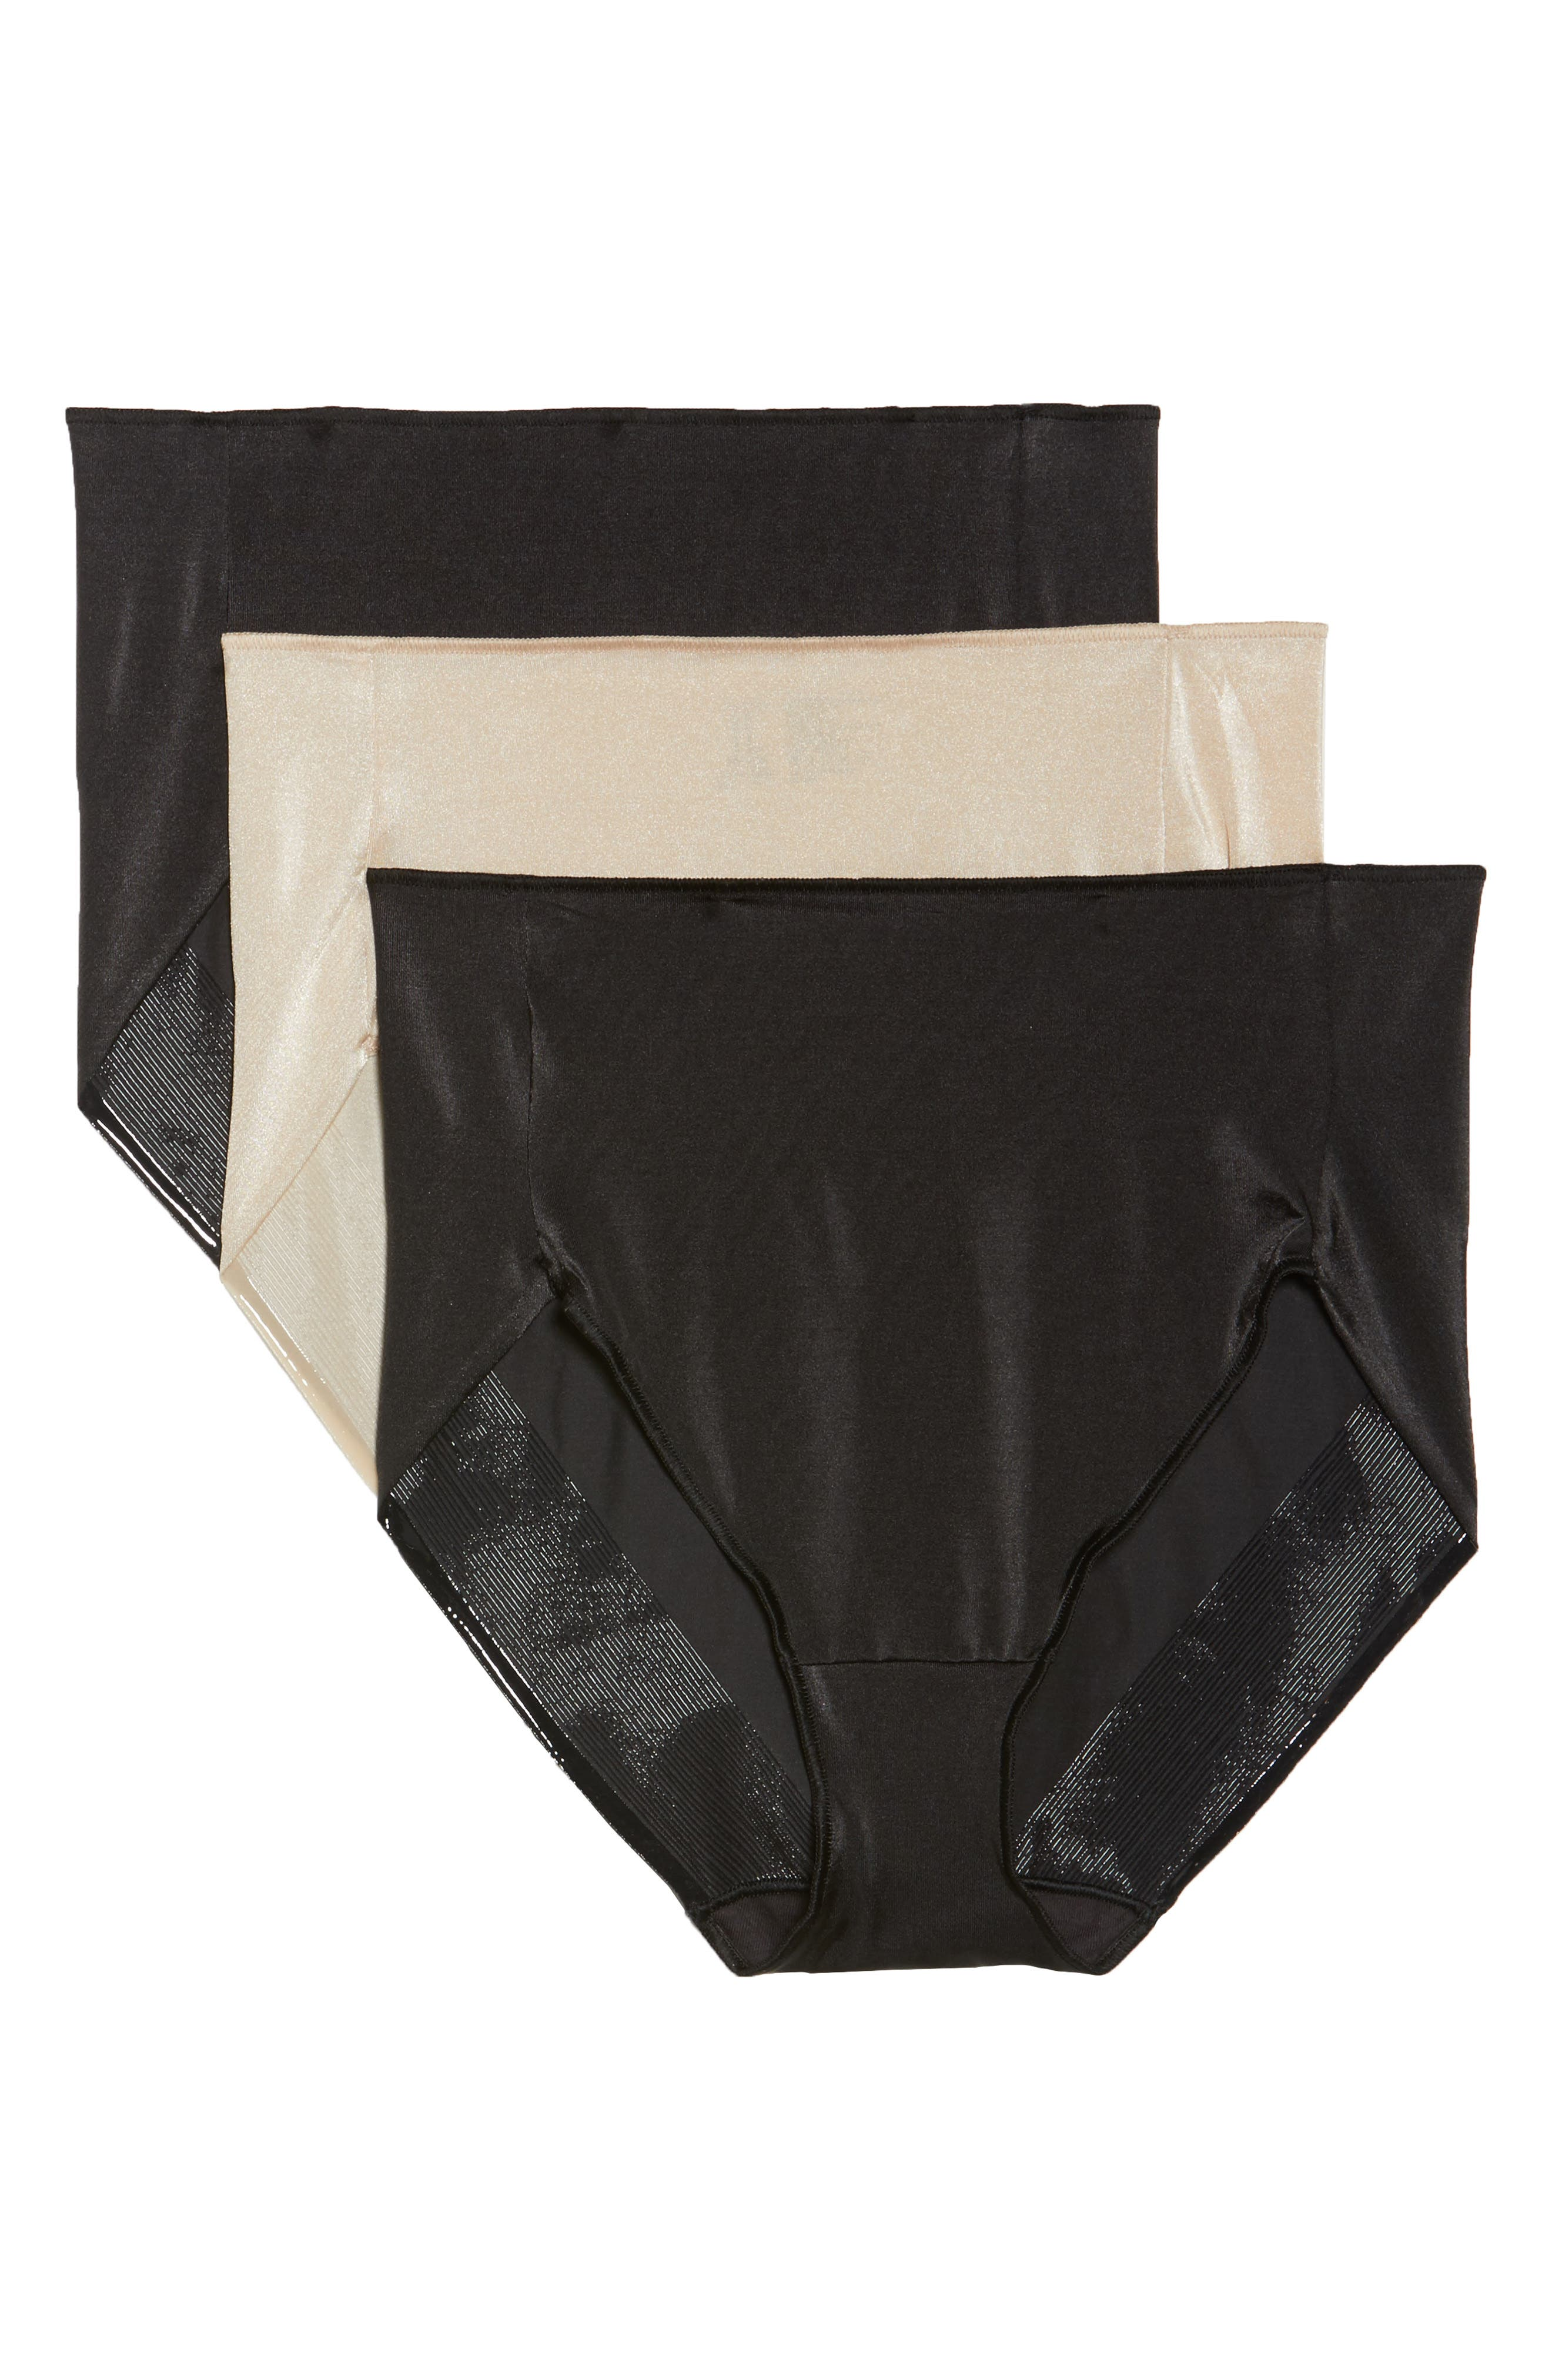 3-Pack High Waist Briefs,                         Main,                         color, Black/ Nude